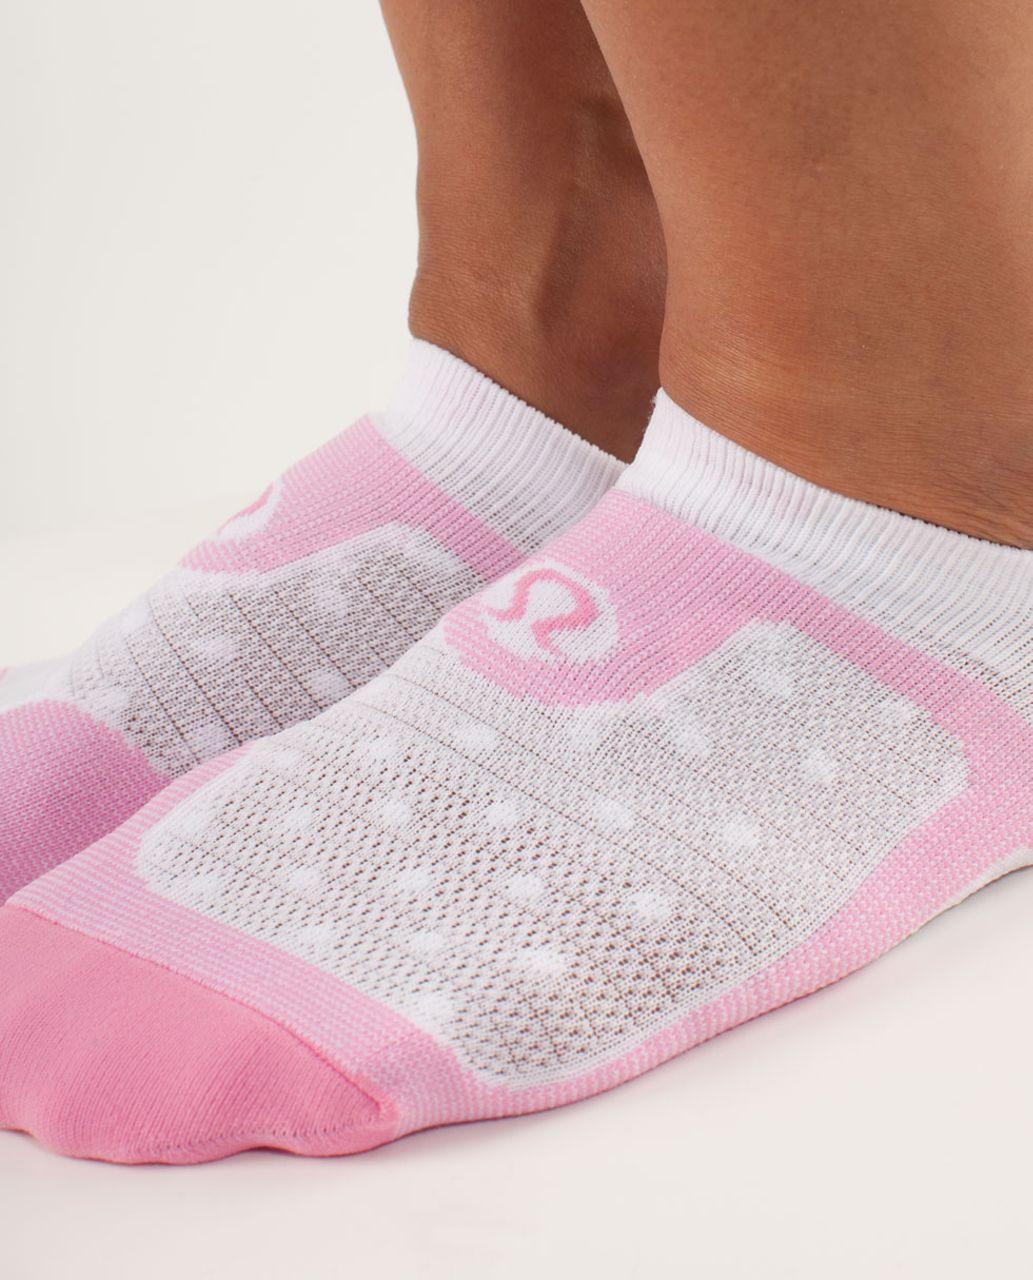 Lululemon Women's No Show Ultimate - Feeder Stripe Pow Pink Light / White / White White High Noon Dot